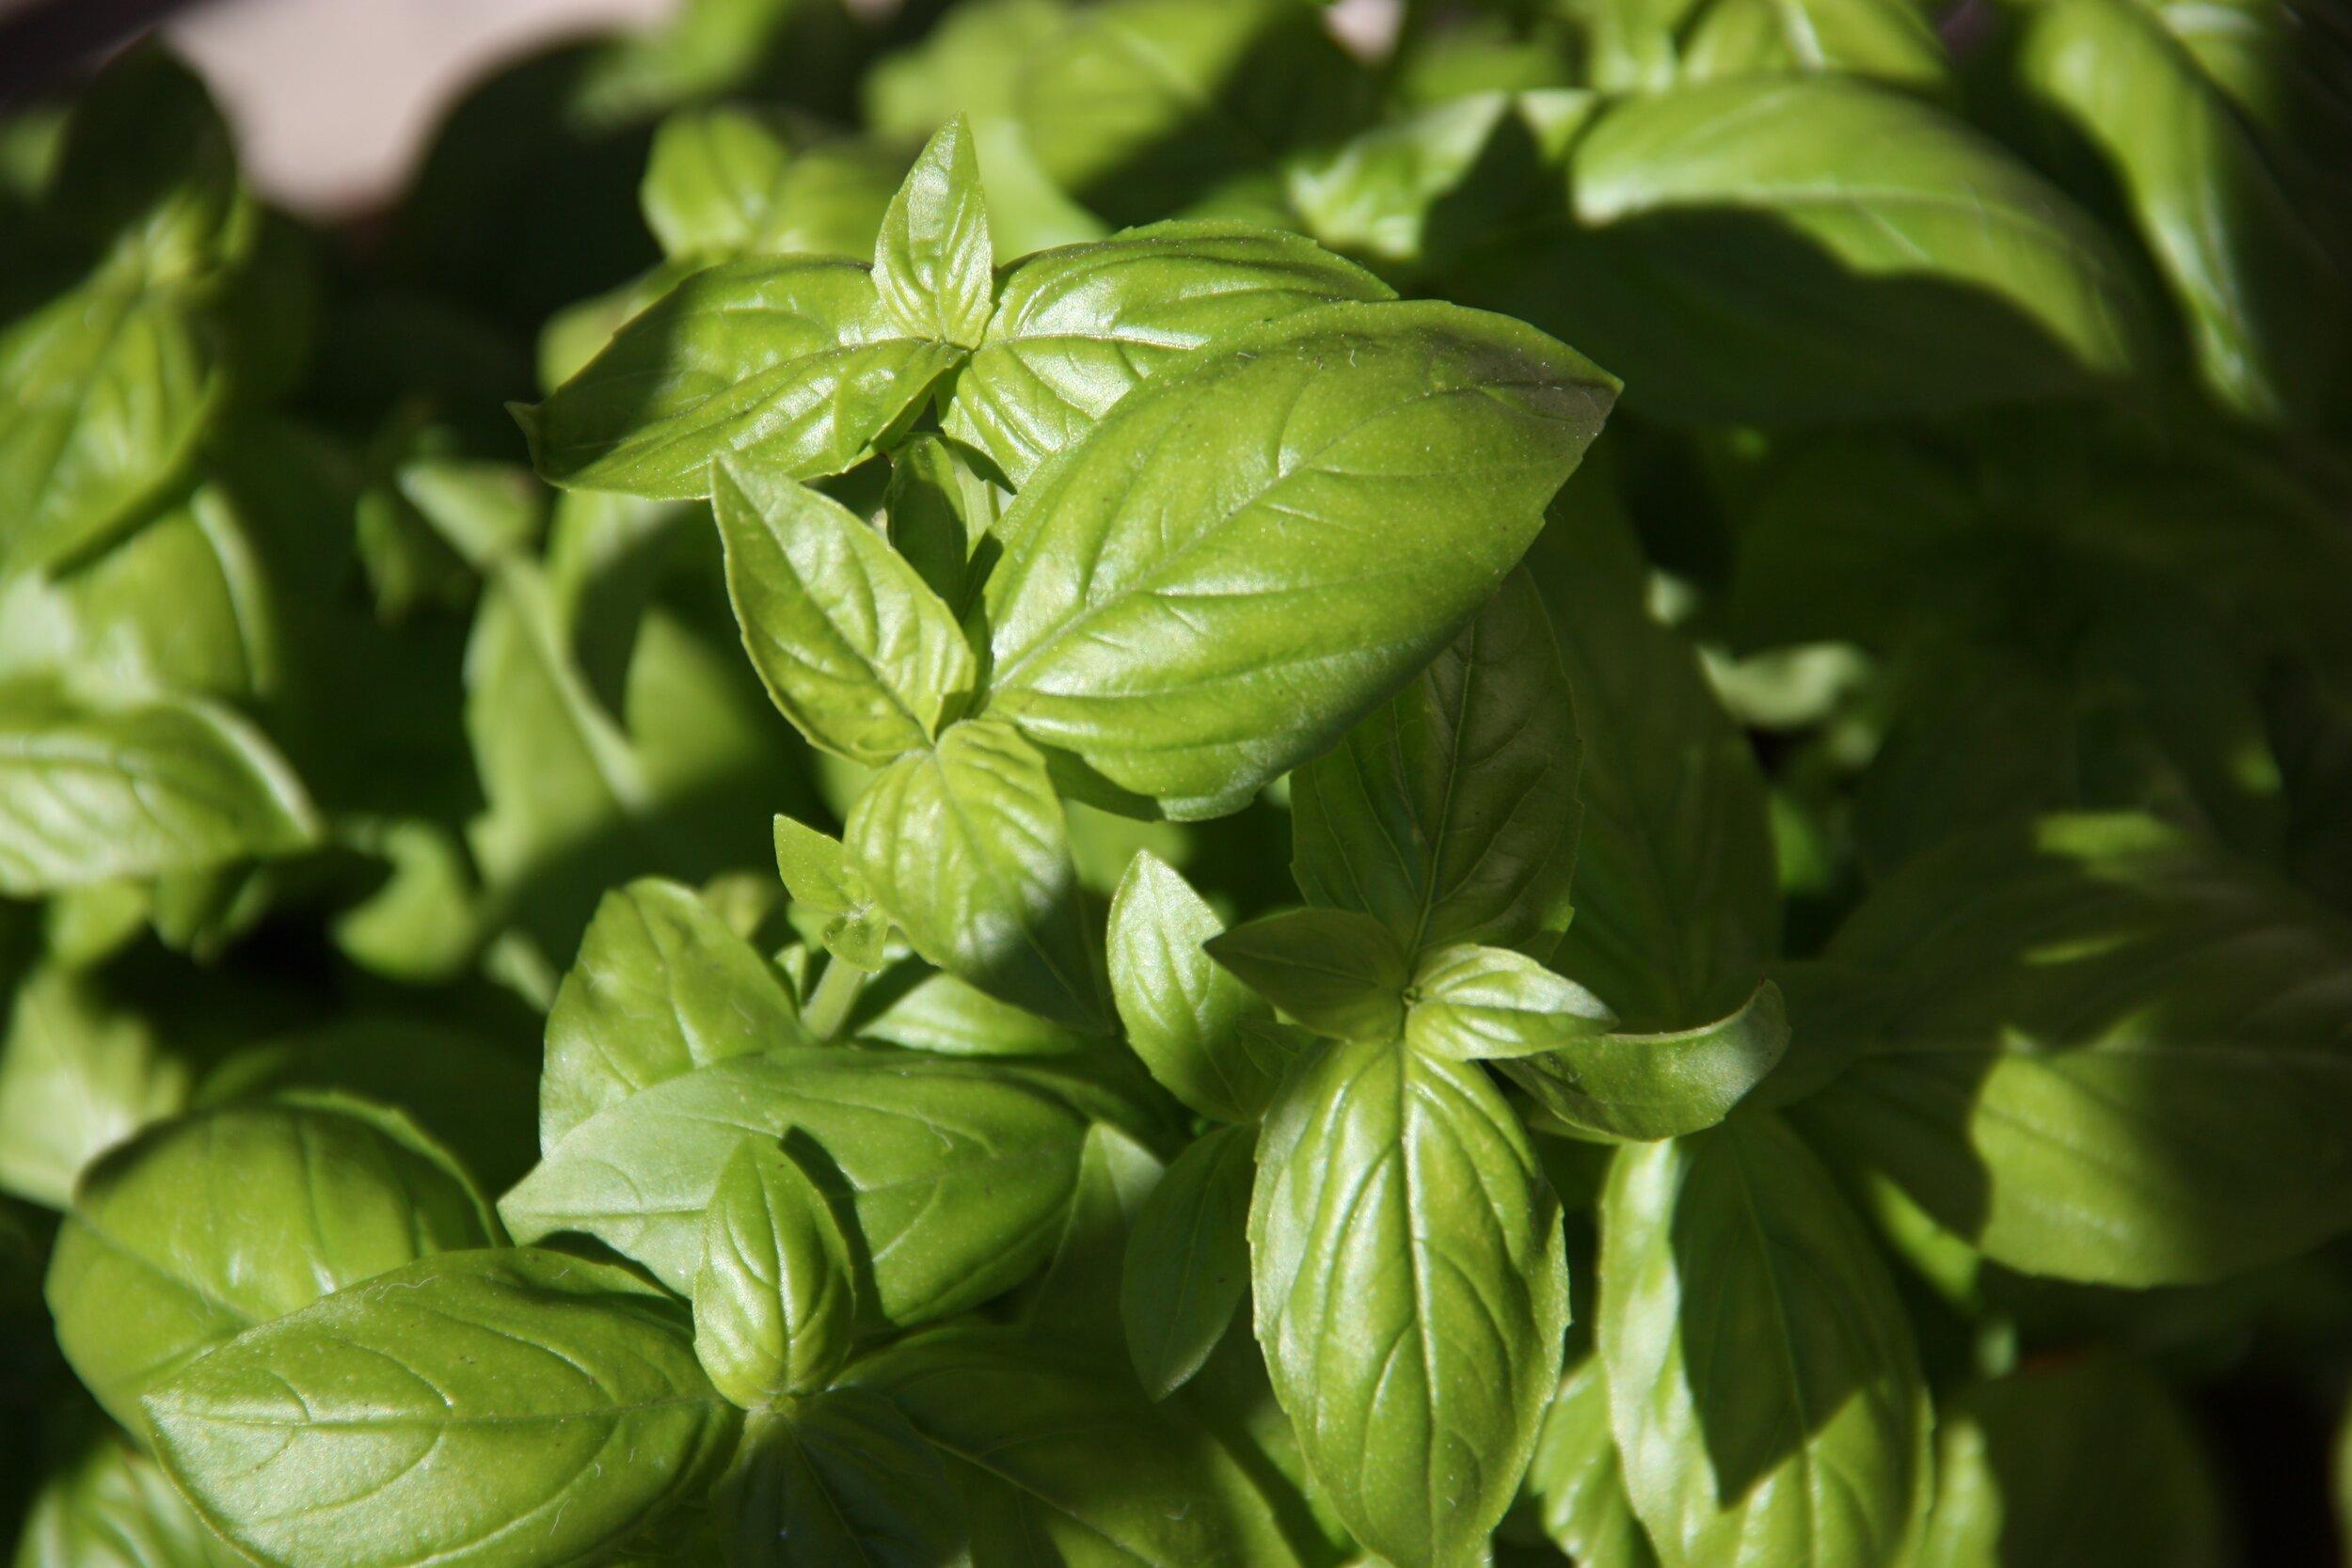 Herbs, particularly basil, are an anchor of Ligurian cuisine. (Photograph: Alissa De Leva, Unsplash)